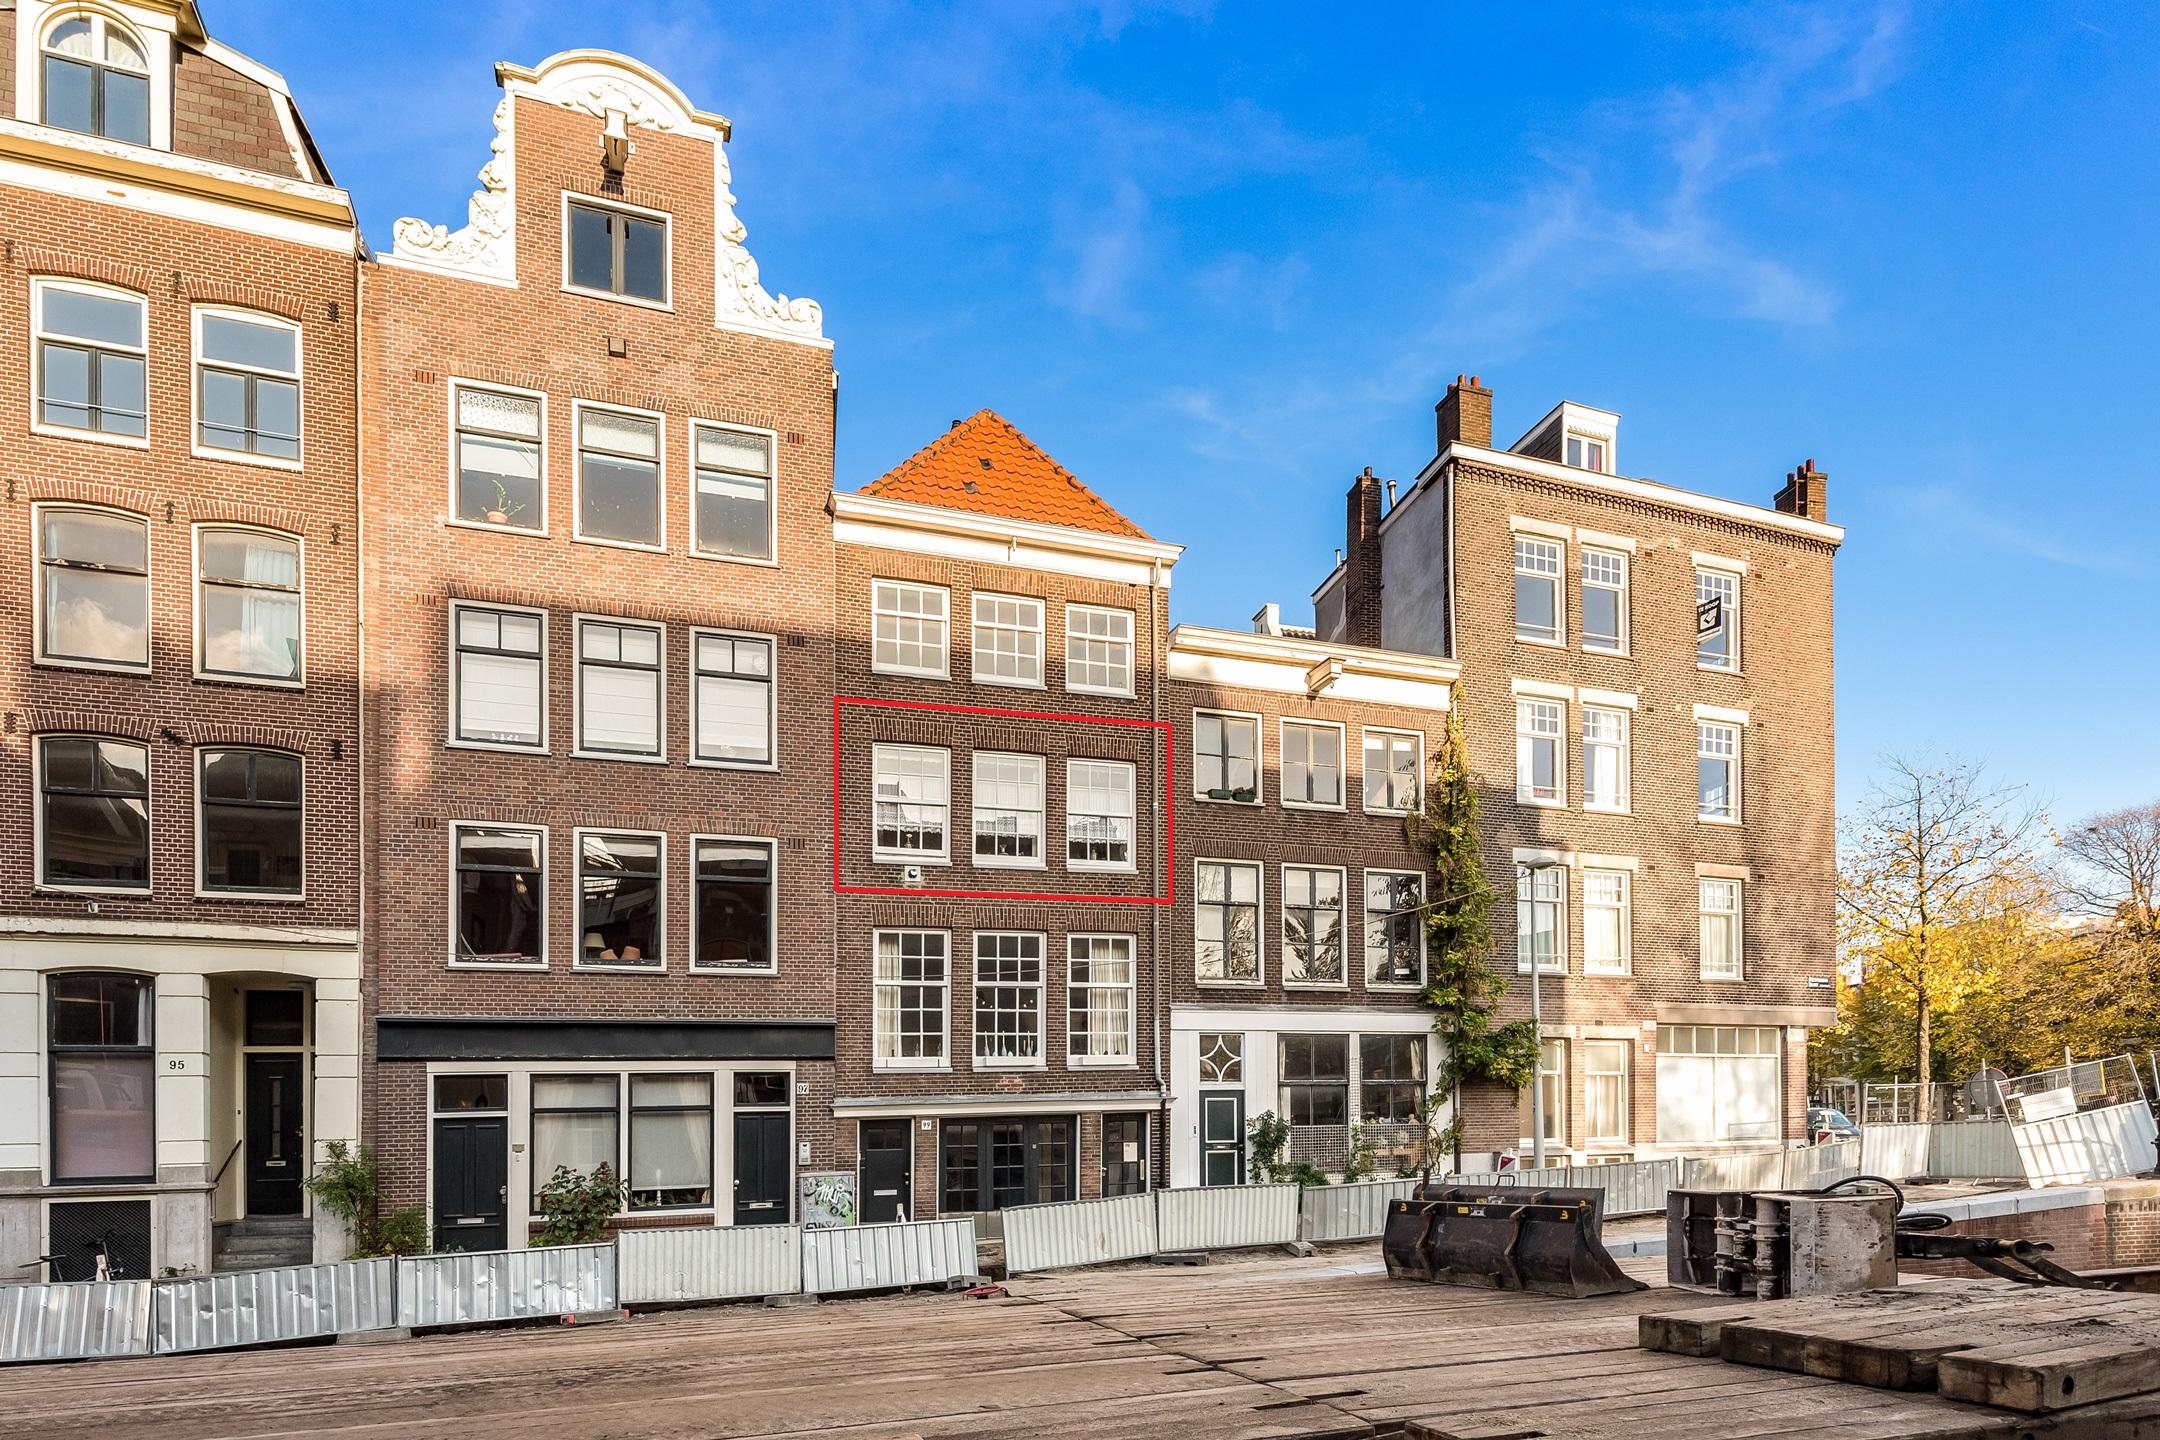 Lunshof makelaars Amstelveen en Amsterdam - Recht Boomssloot 99 I Amsterdam